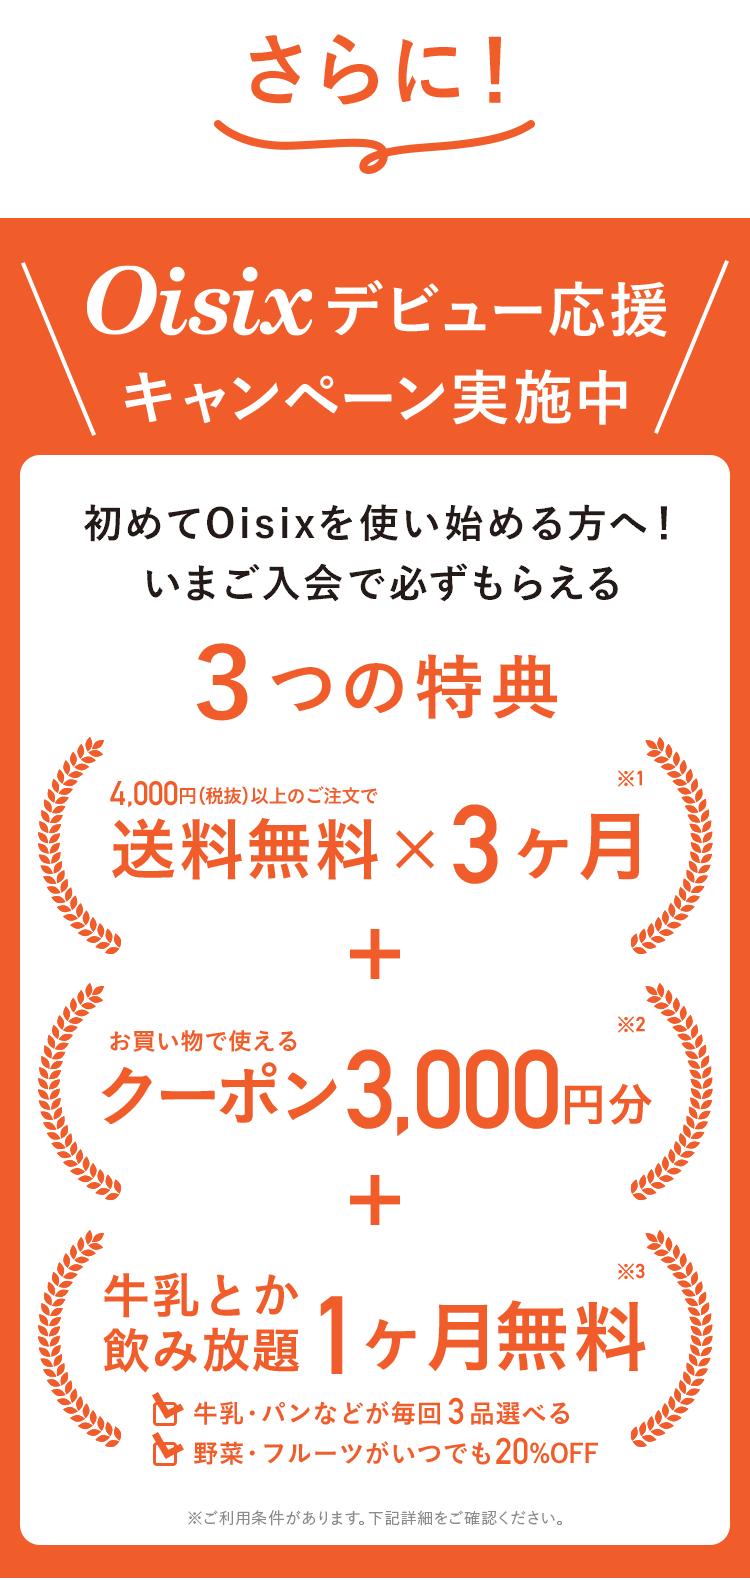 Oisixデビュー応援キャンペーン